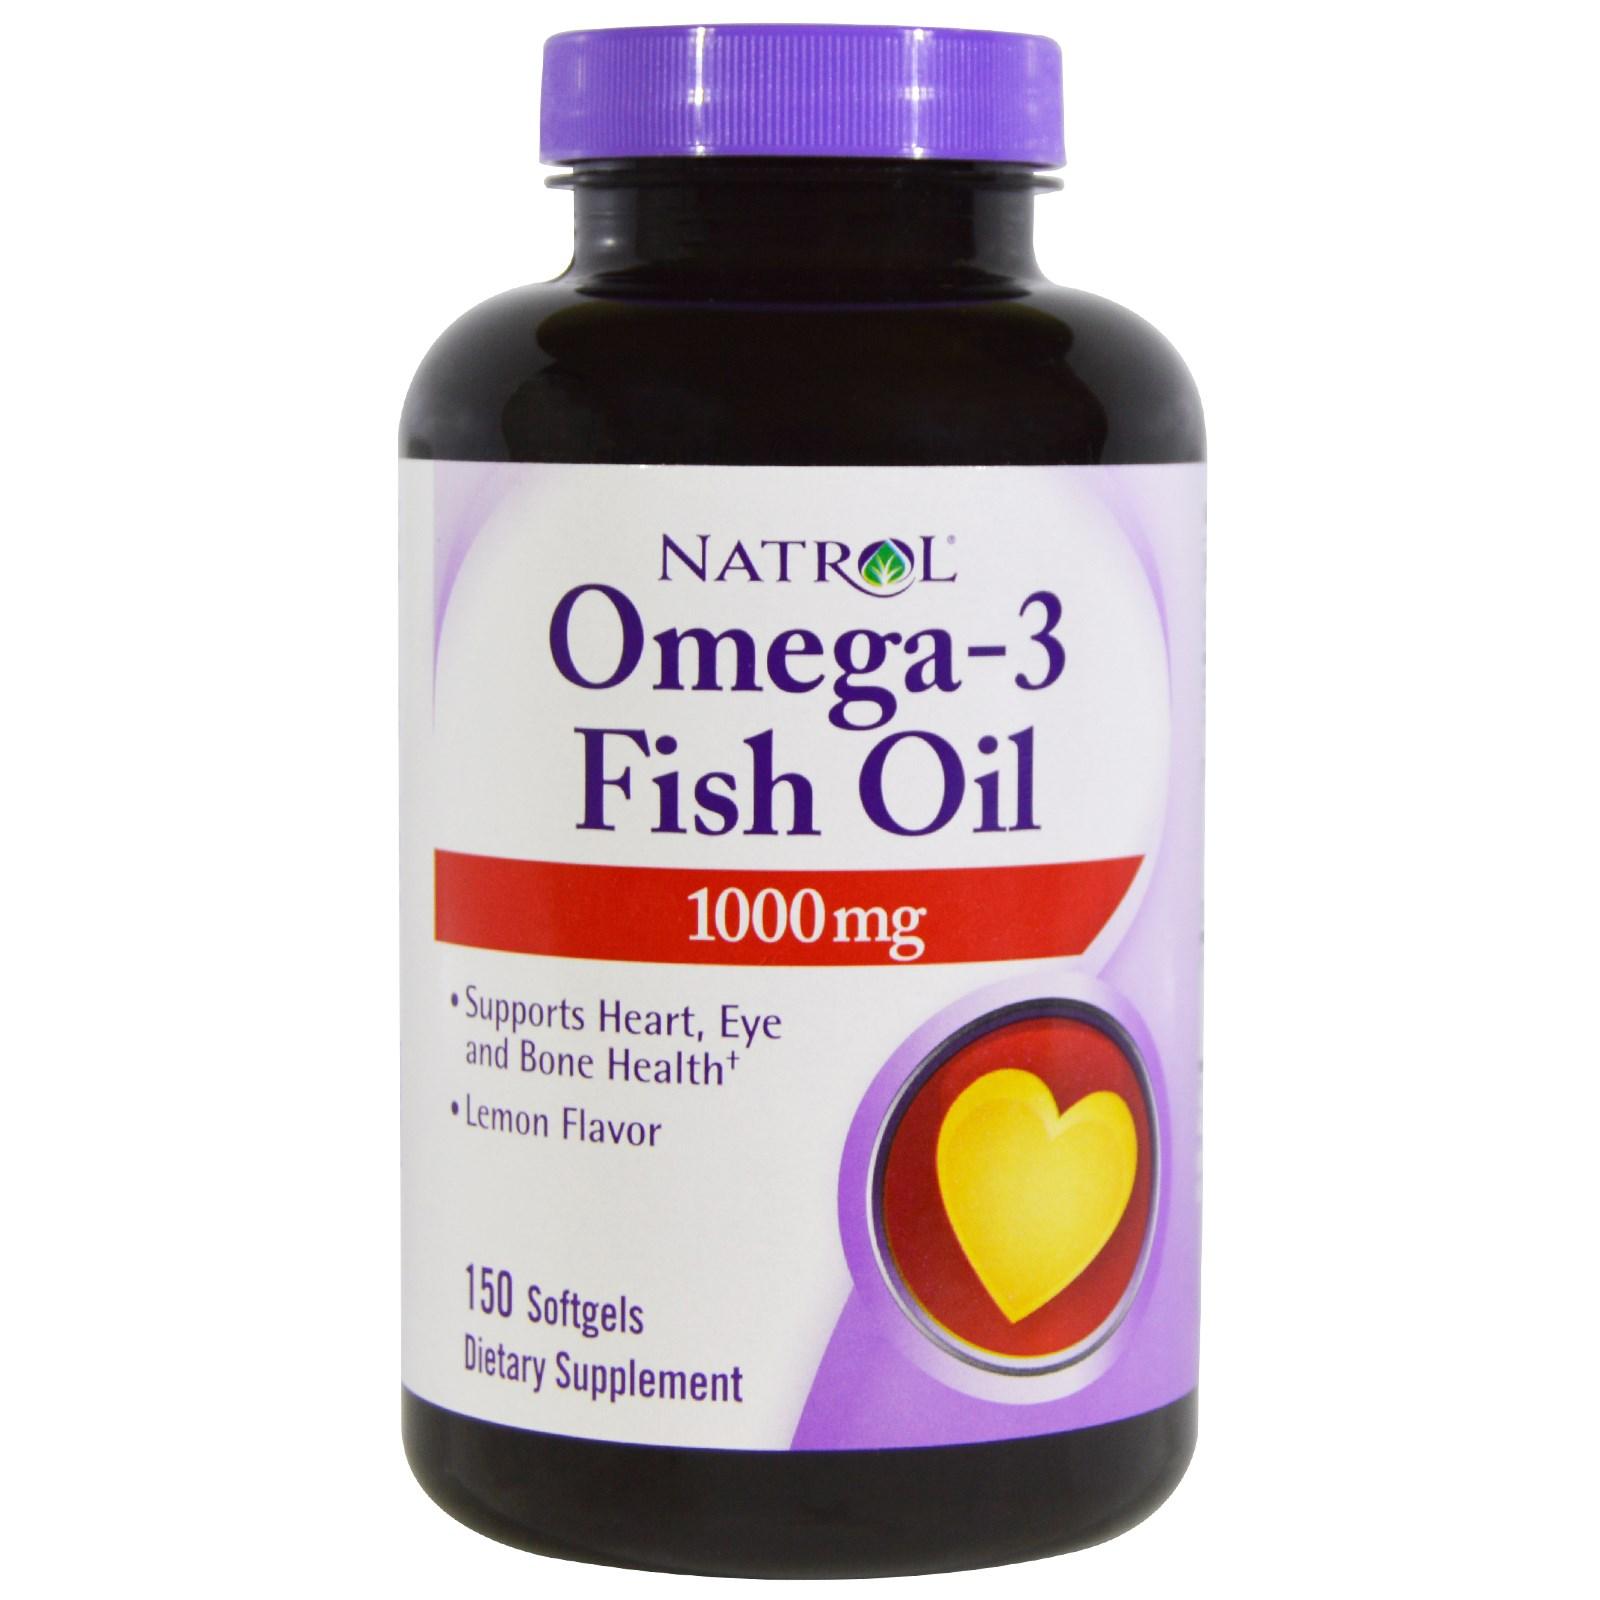 Natrol, Omega-3 Fish Oil, Lemon Flavor, 1,000 mg, 150 Softgels